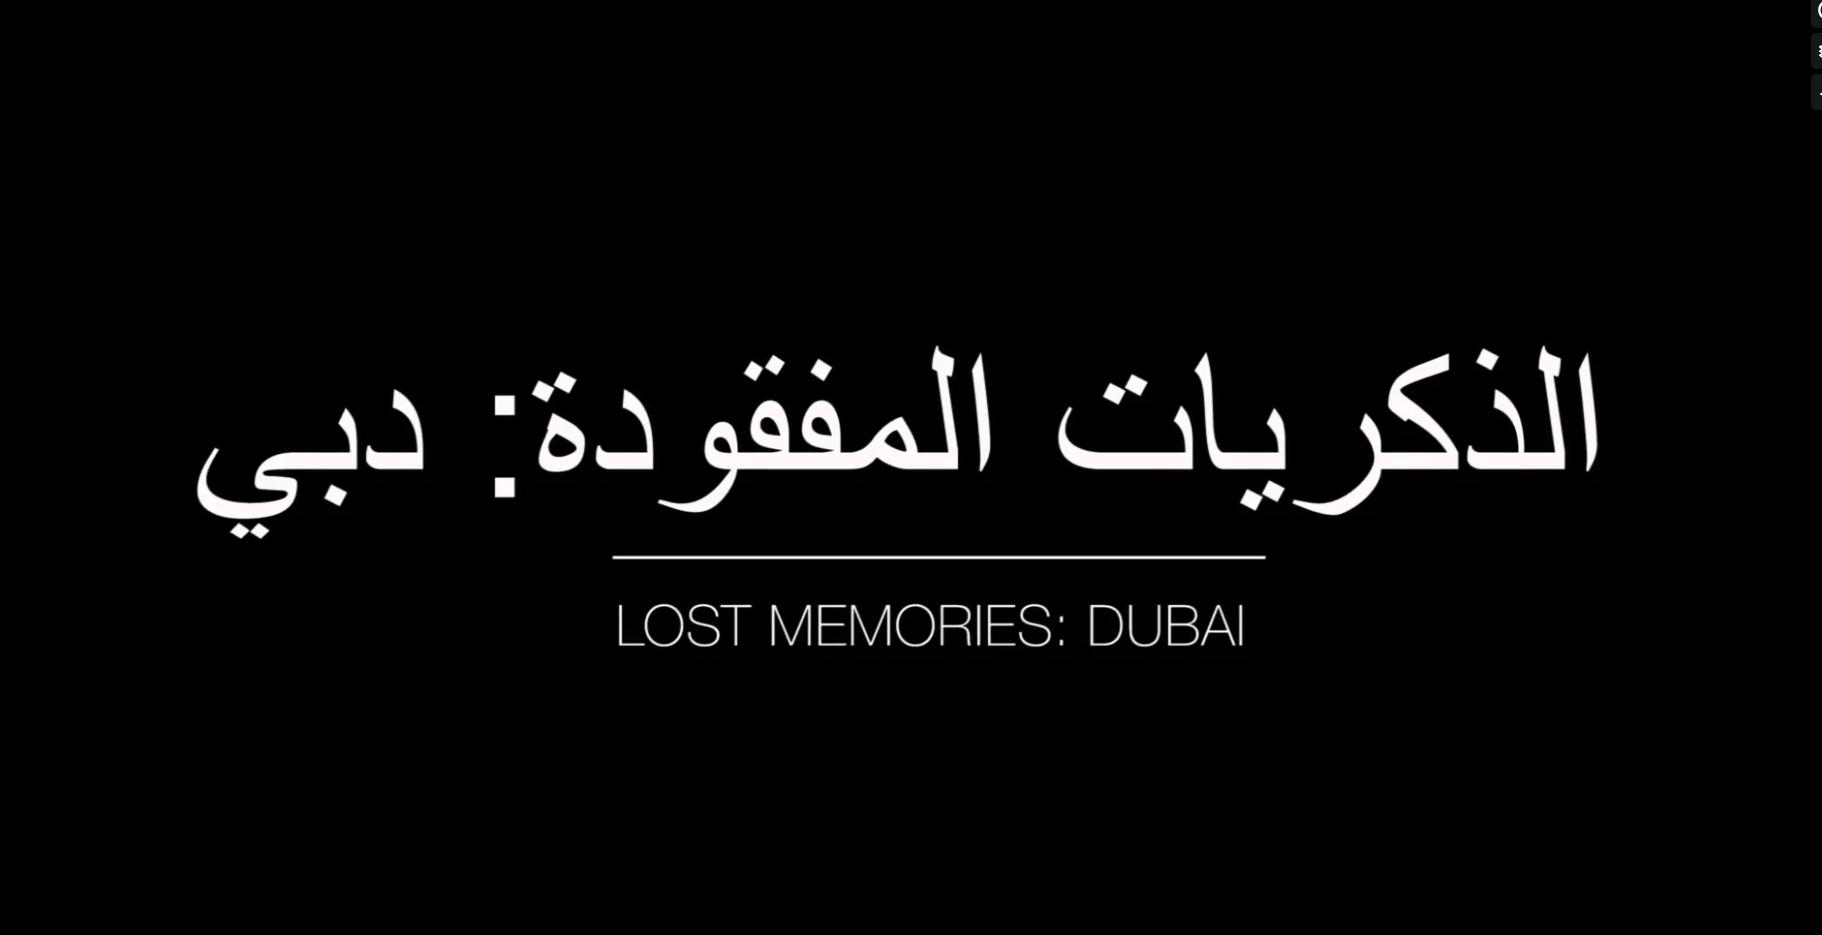 Lost Memories: Dubai - Full video here: https://vimeo.com/272672866